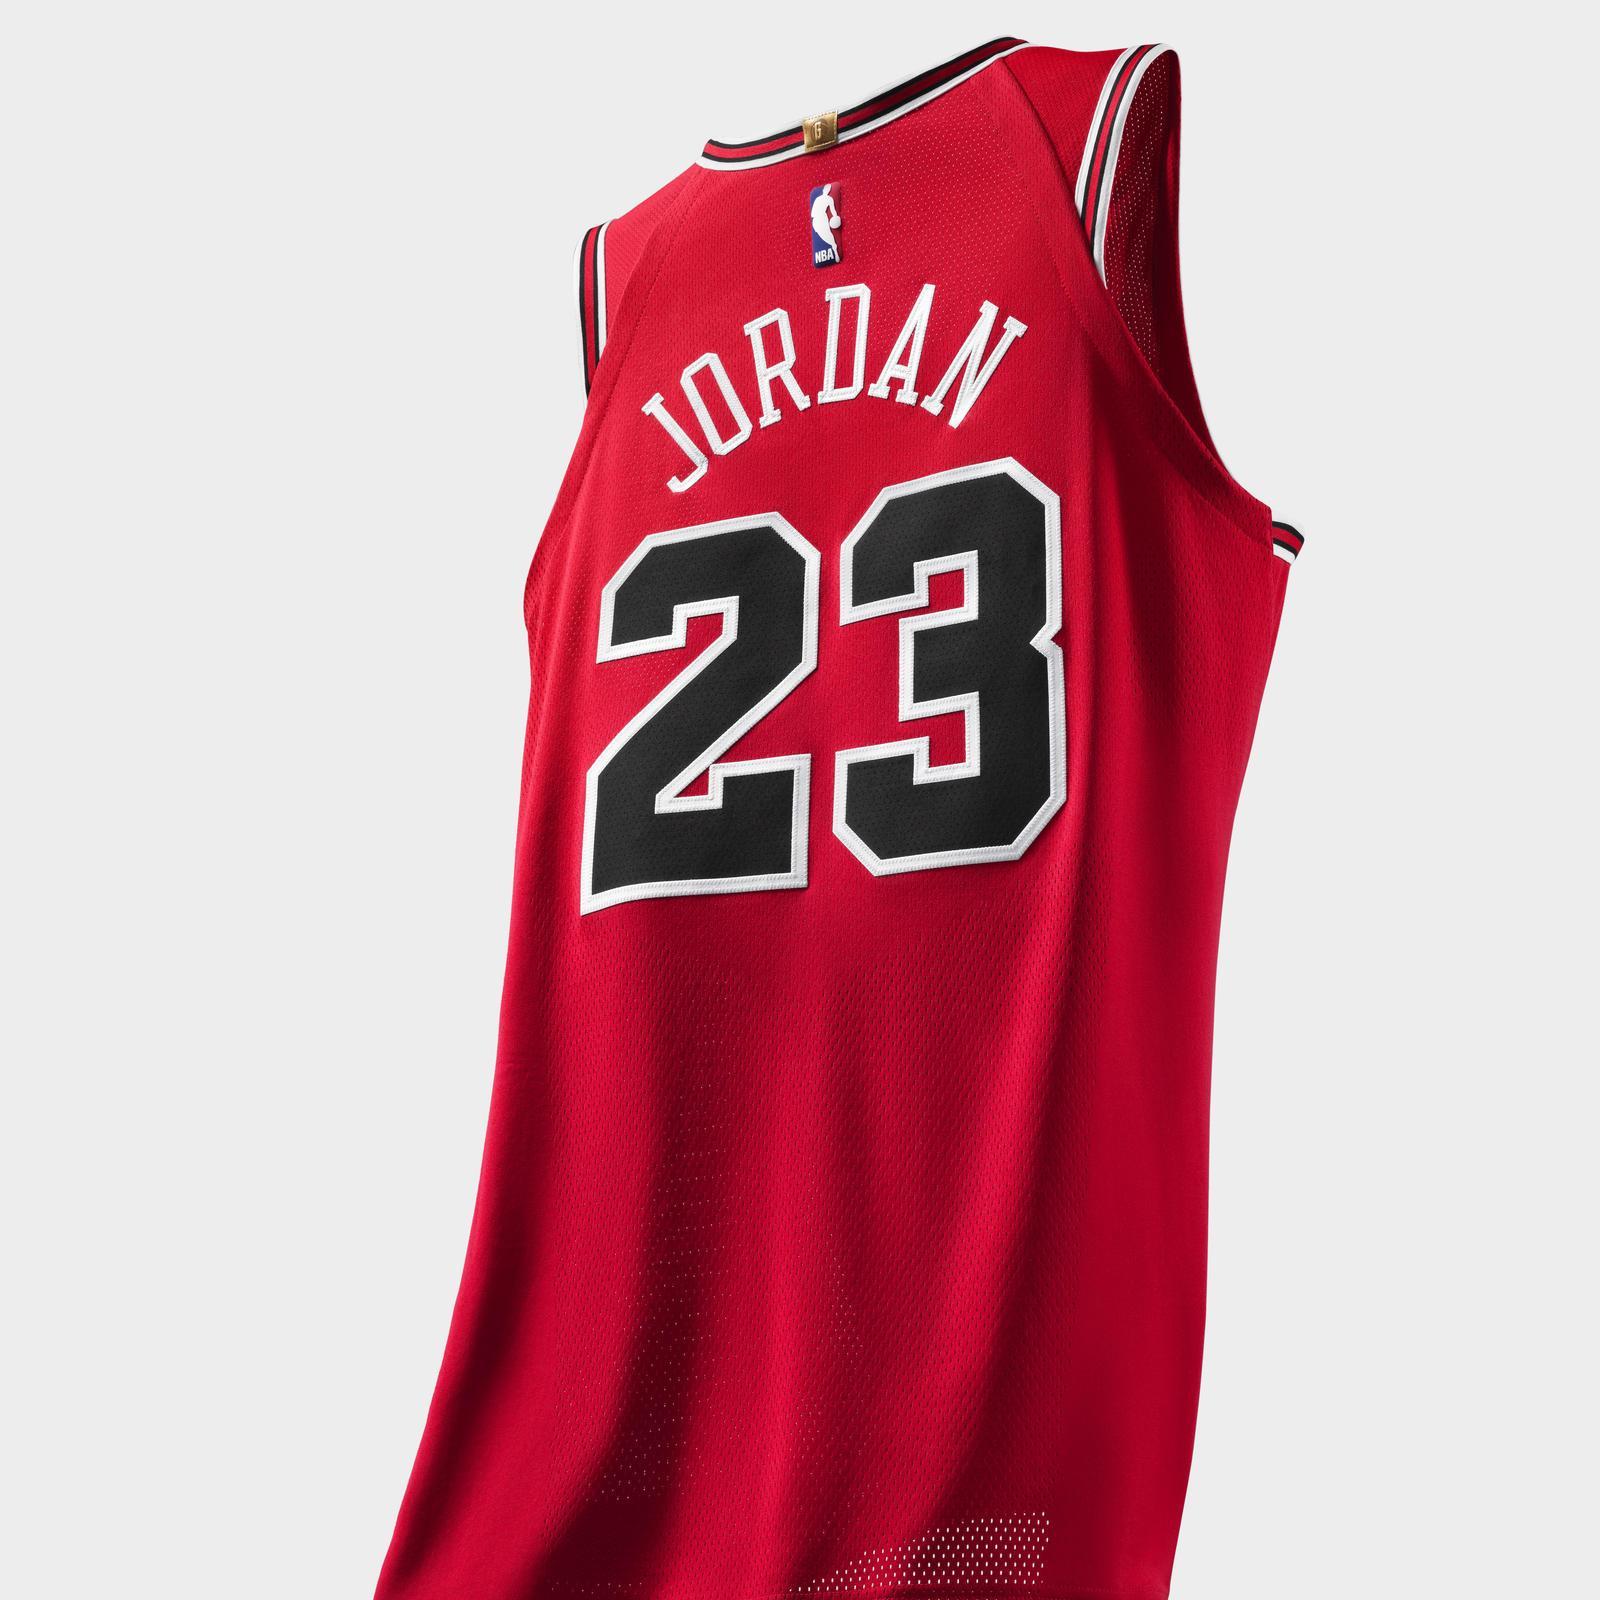 finest selection 21d88 54254 NBA Chicago Bulls Vintage Classic Michael Jordan Jersey #23 (MVP) (GOAT)